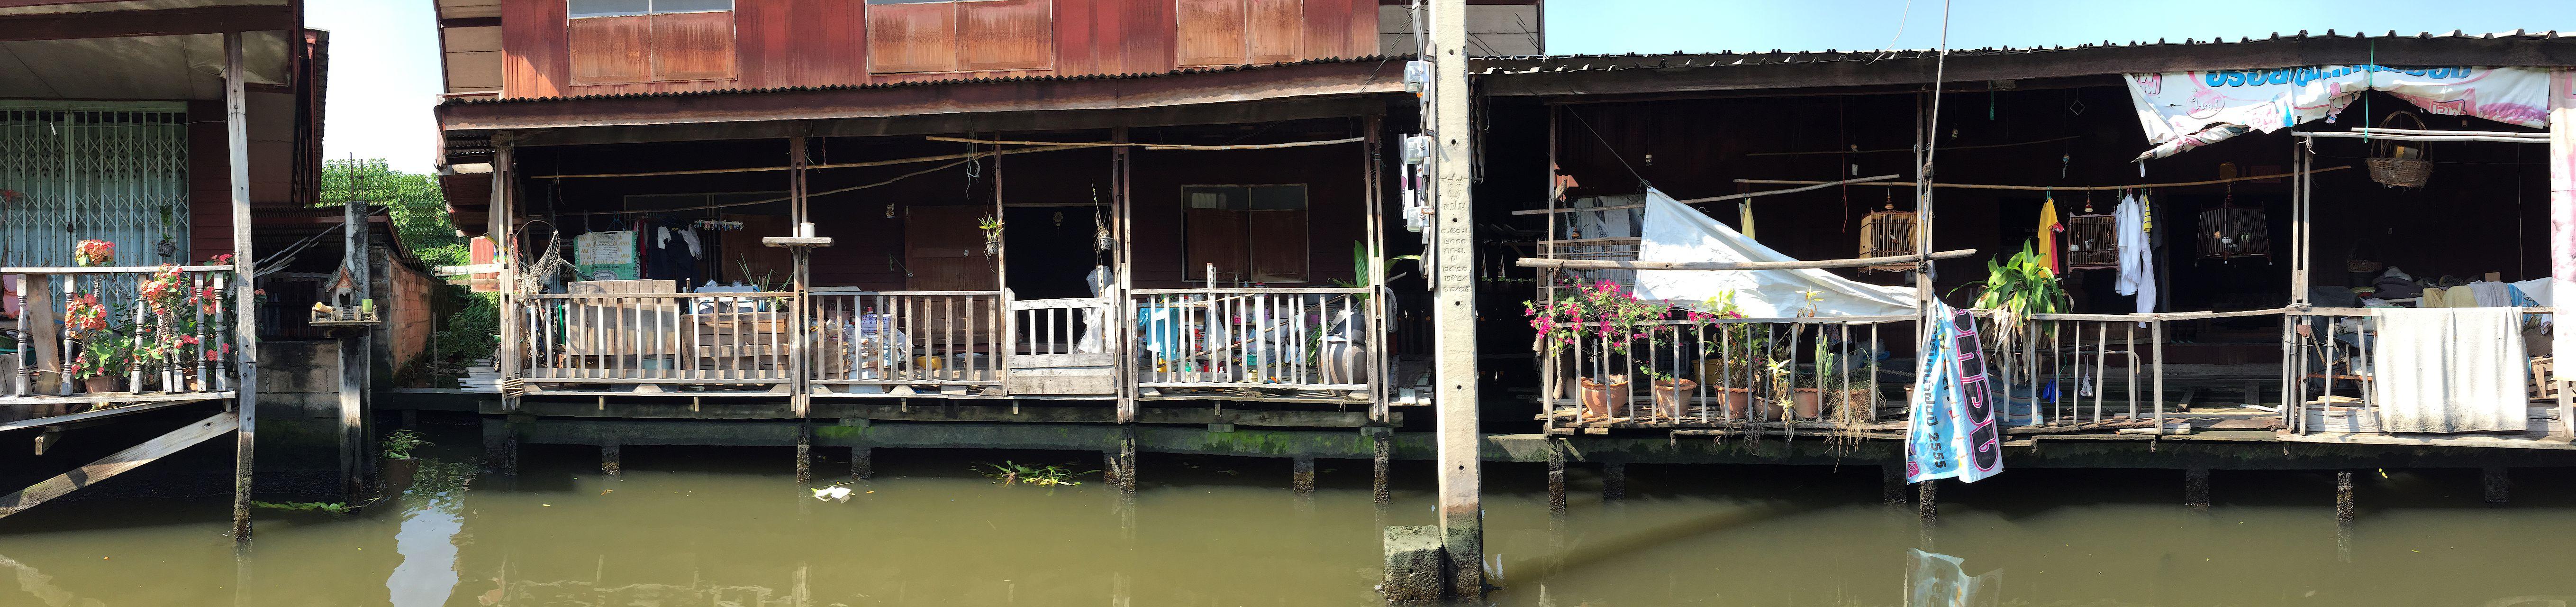 thailandblog10